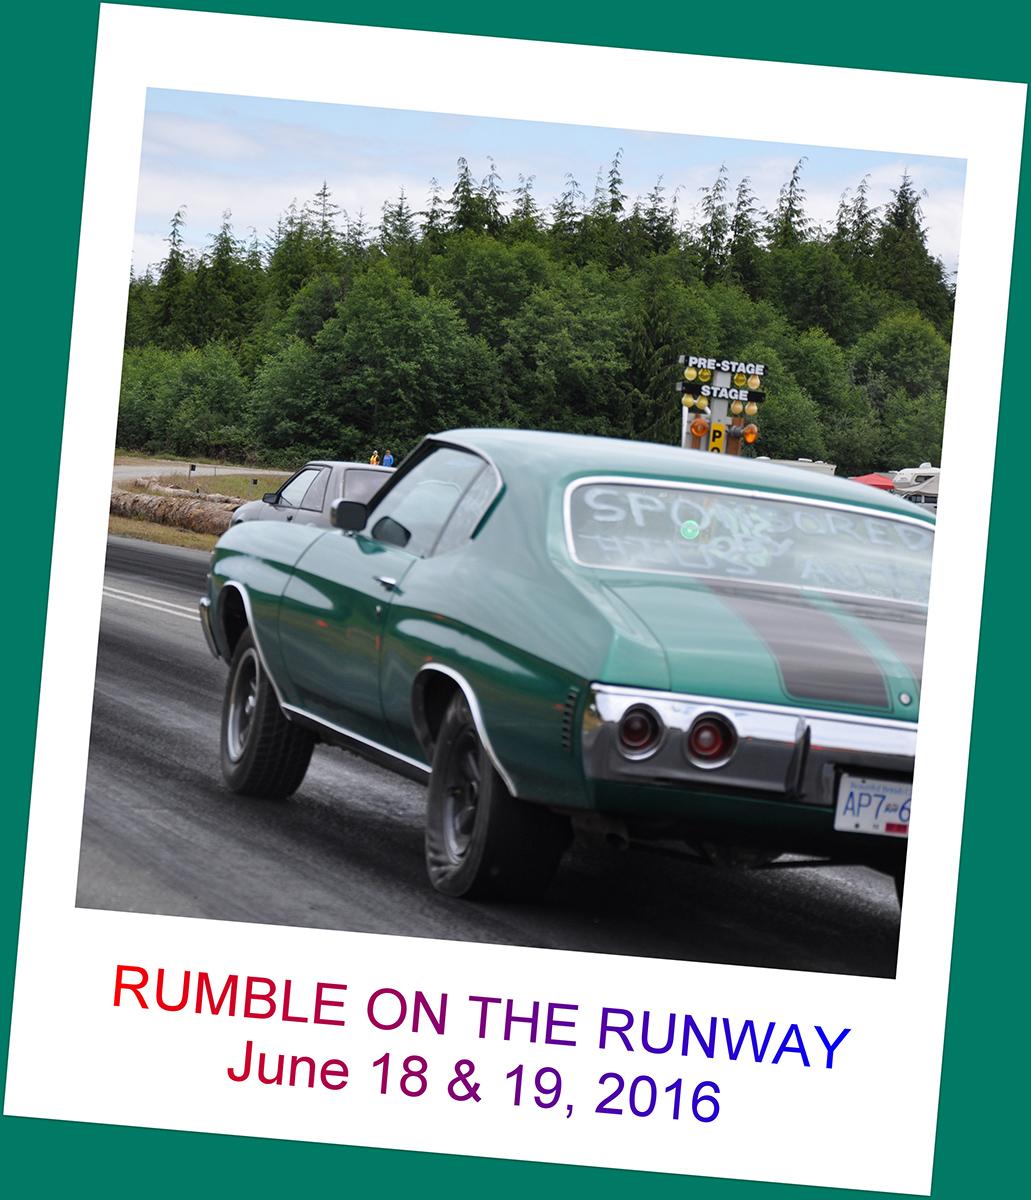 Rumble on the Runway June 18 & 19, 2016 513